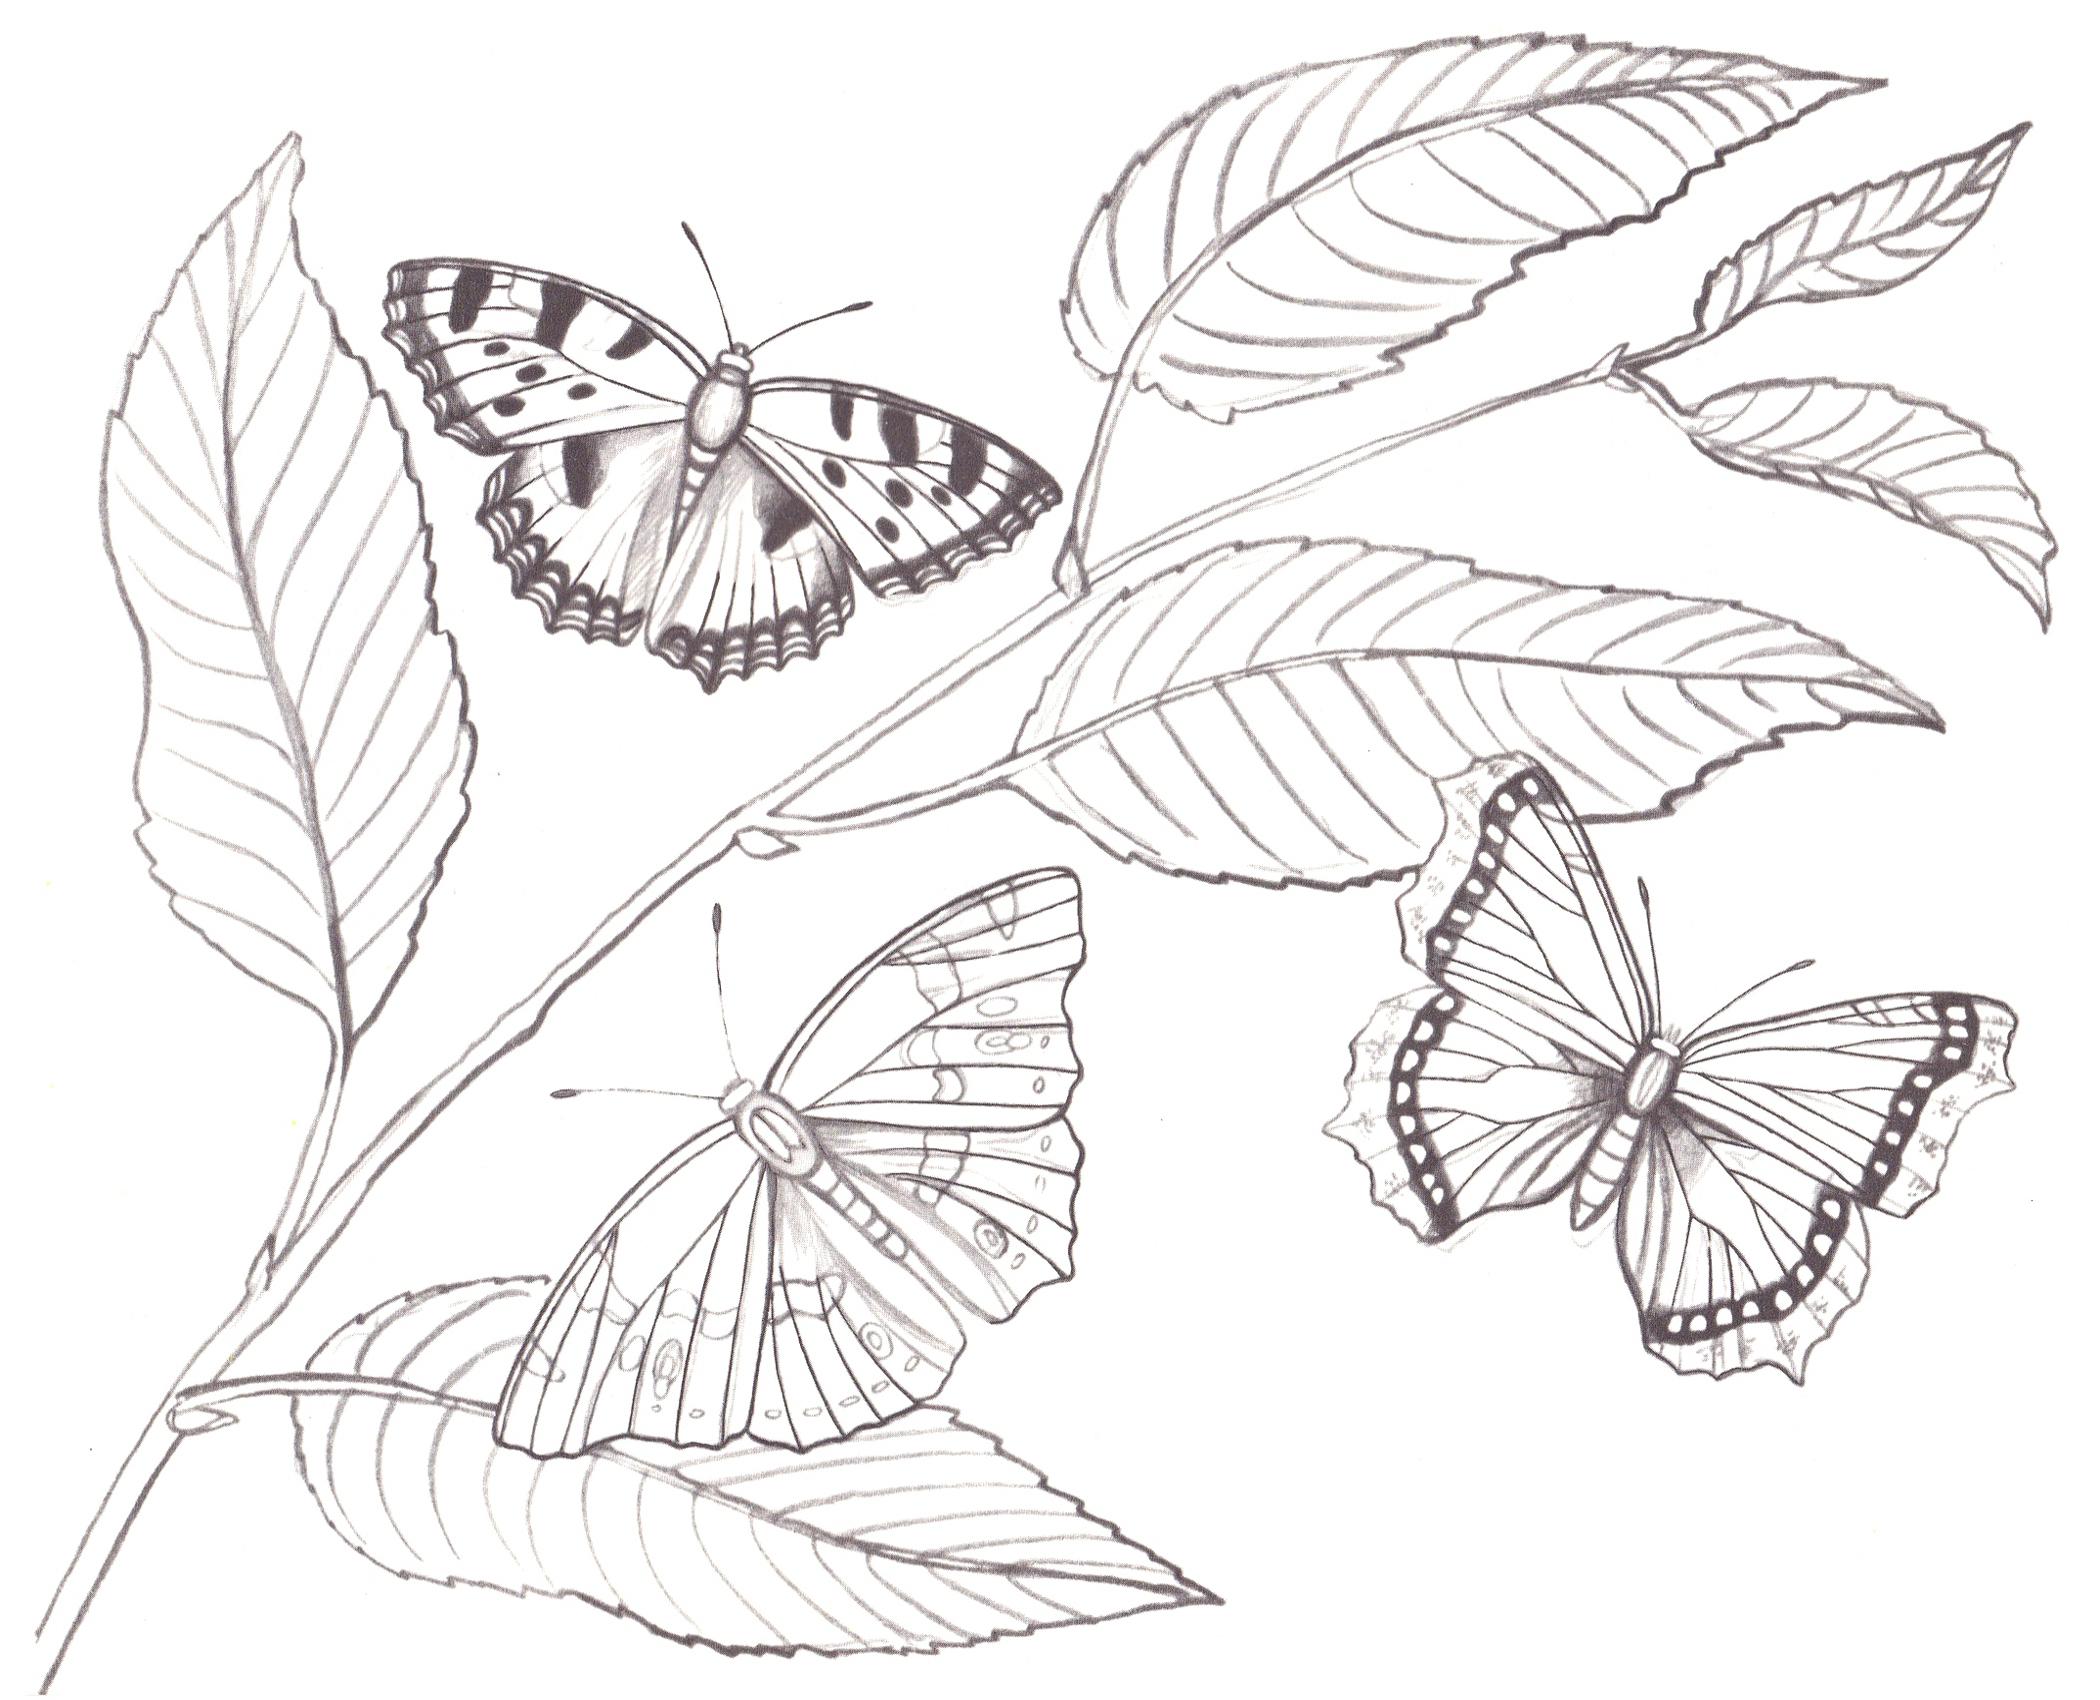 Открытки днем, картинки бабочка на цветке рисунок